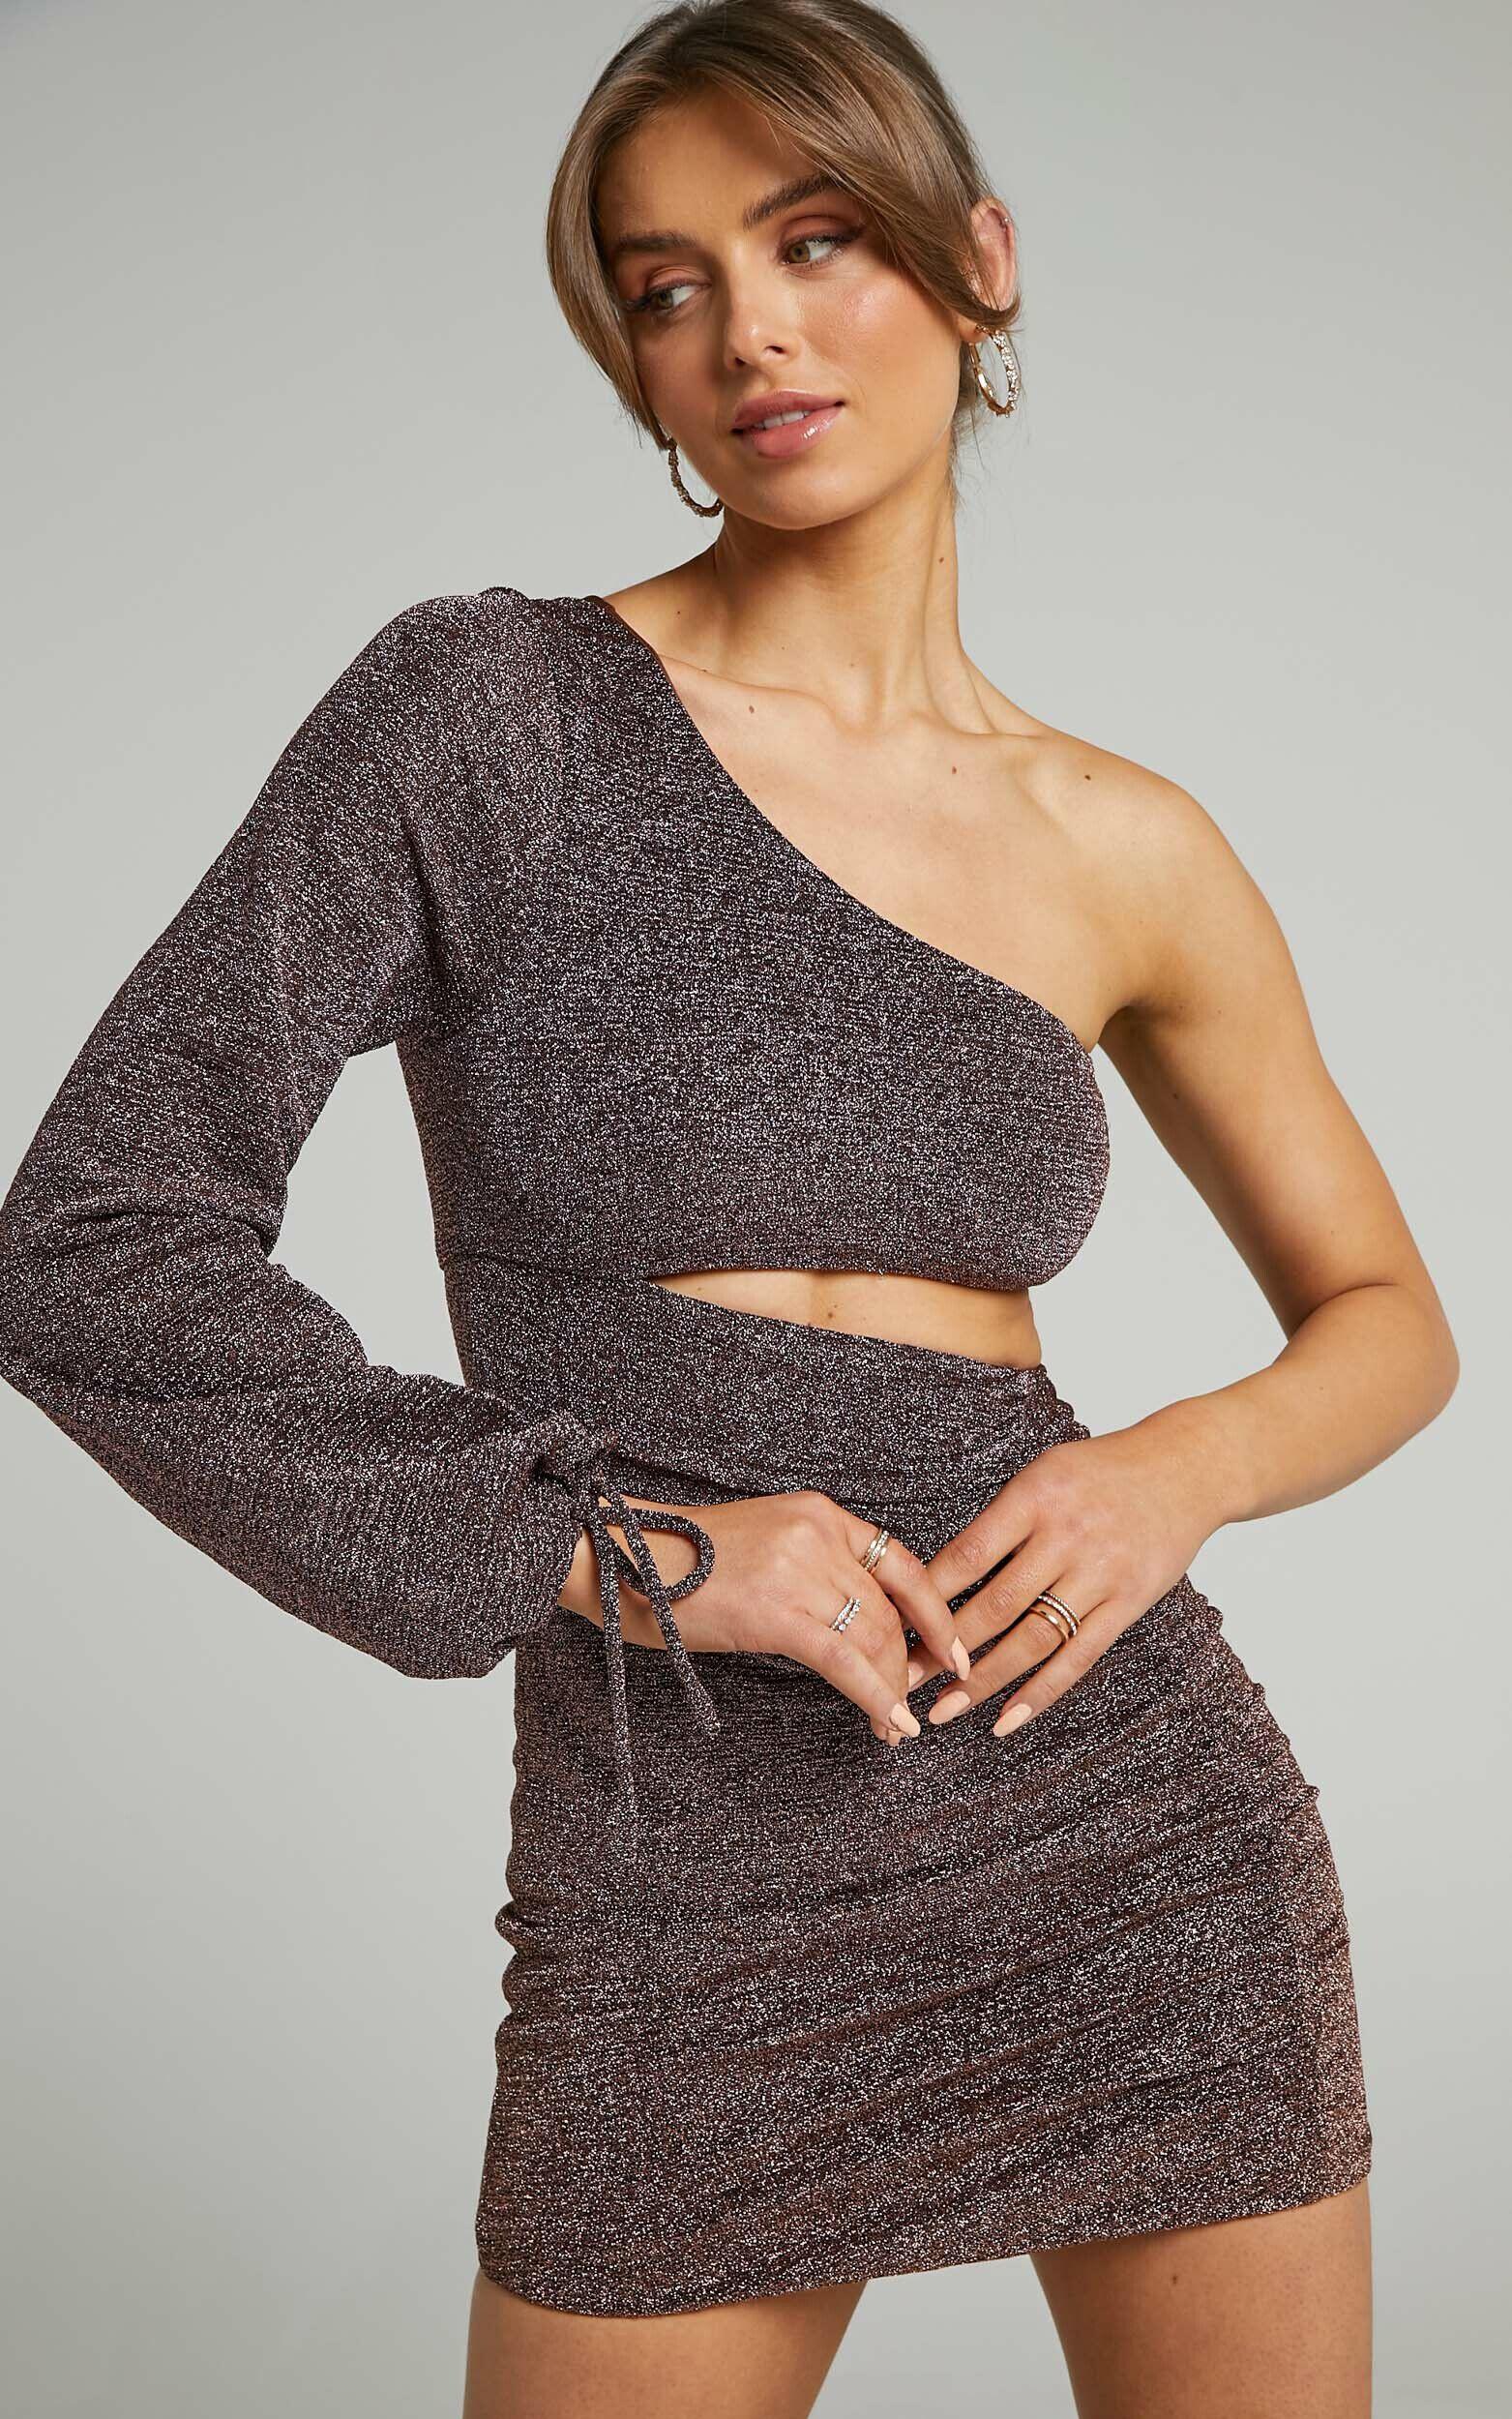 Kuti One Sleeve Asymmetric Mini Bodycon Dress in Chocolate Lurex - 06, BRN1, super-hi-res image number null